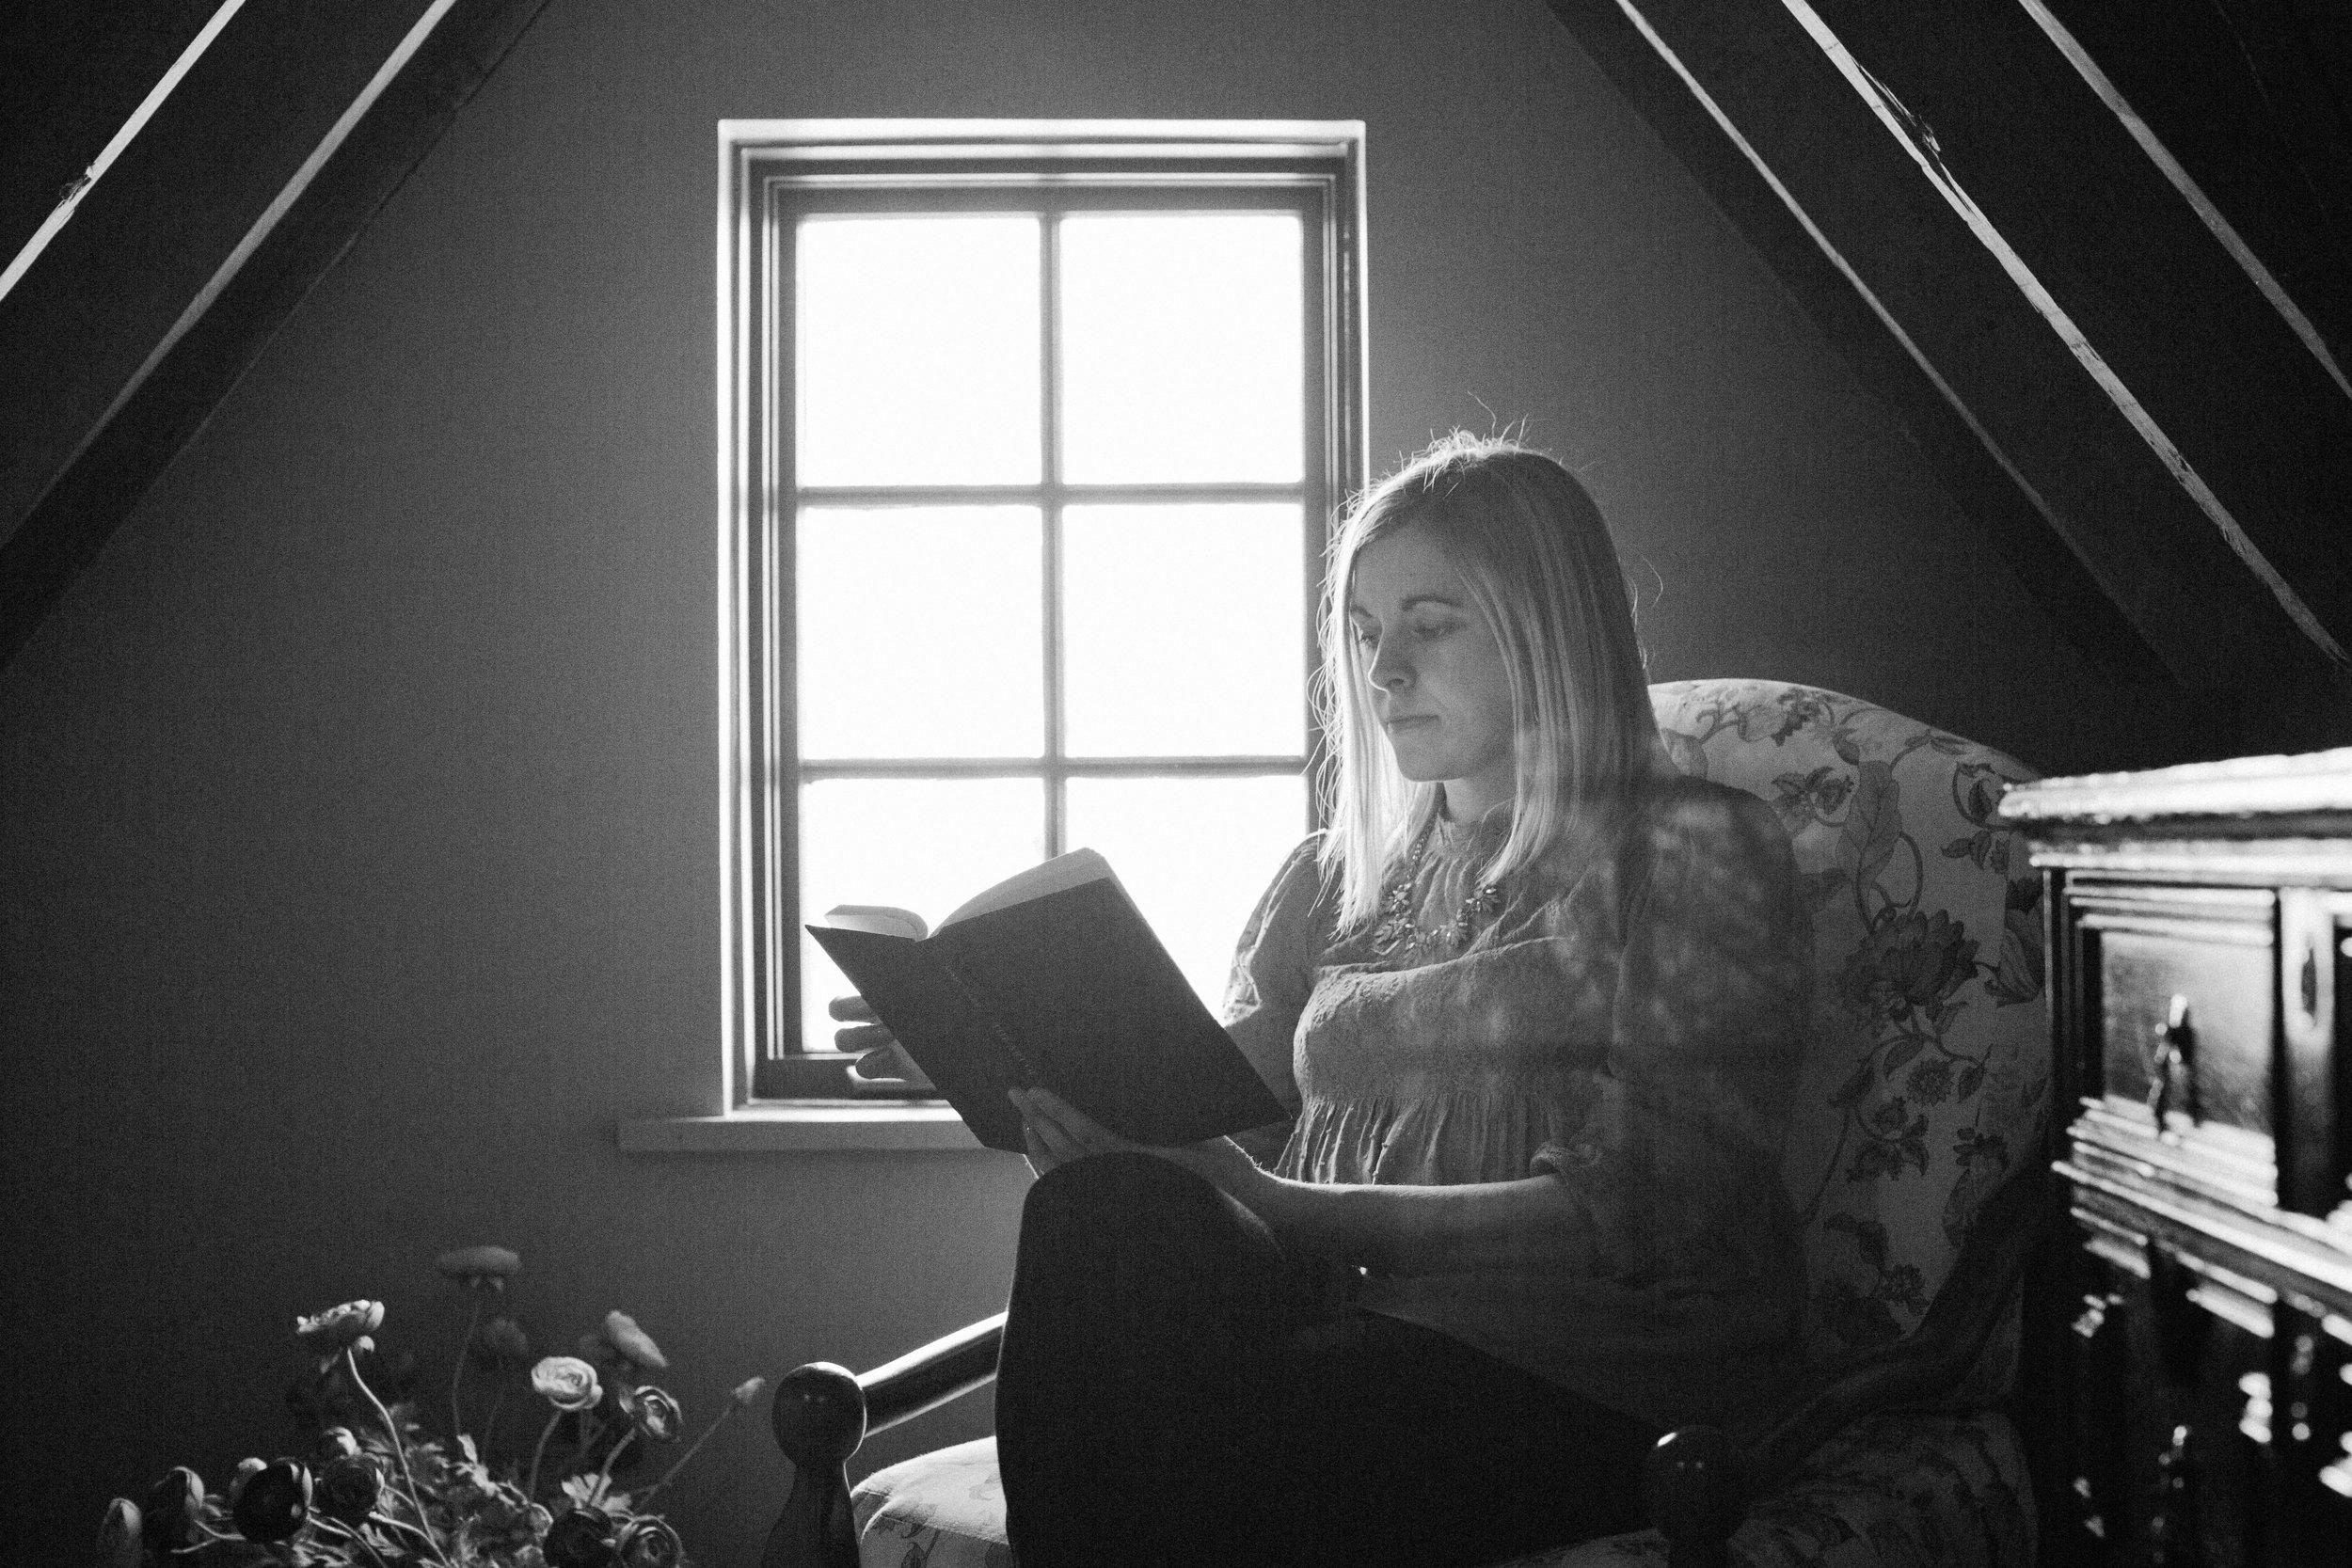 PURSUIT-BW reading chair horiz.jpg